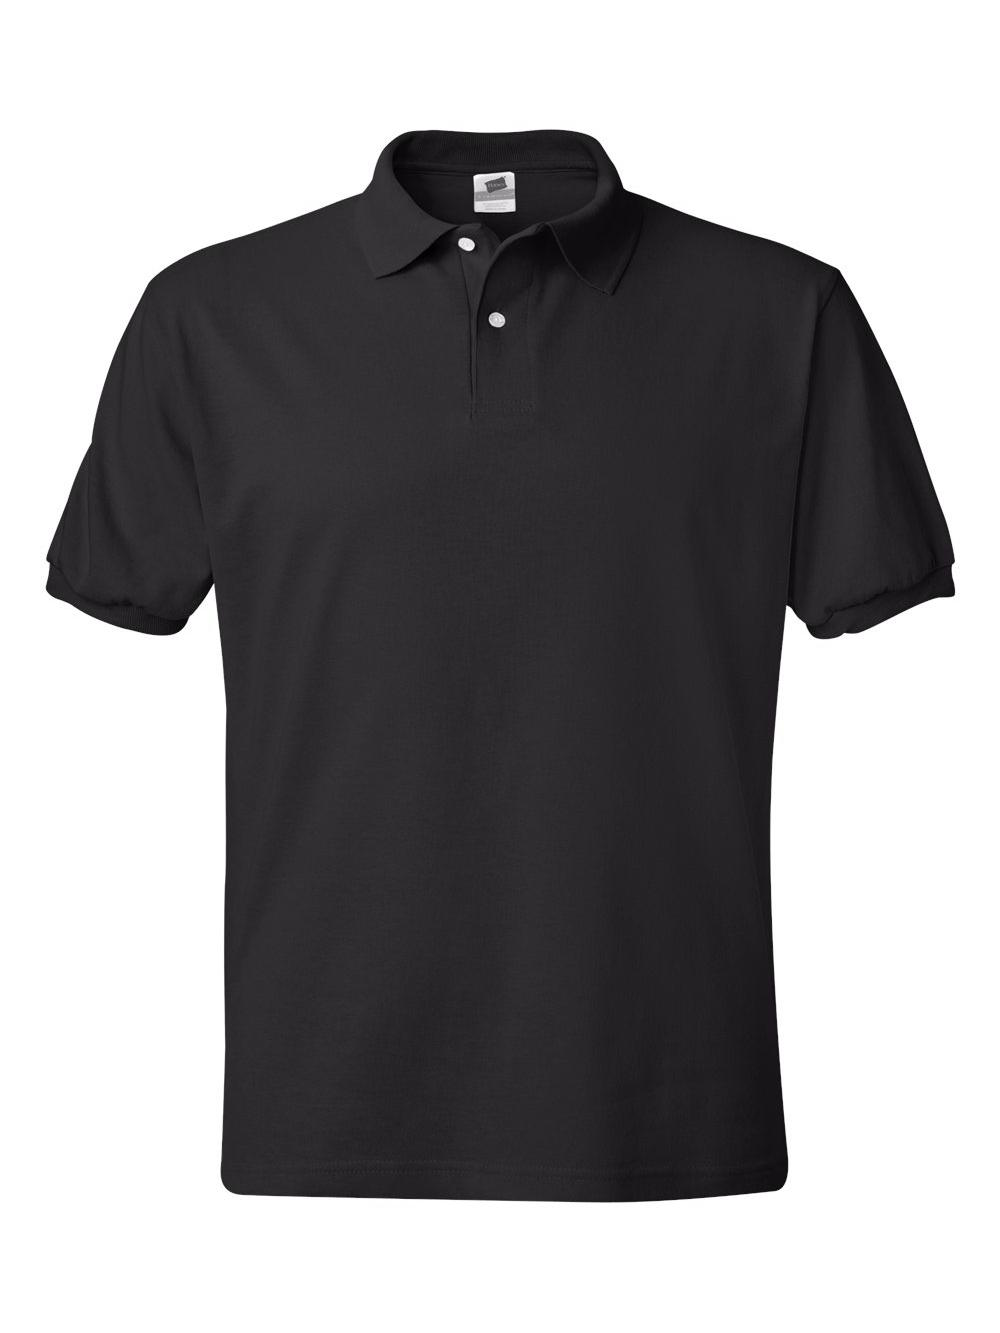 Hanes-Ecosmart-Jersey-Sport-Shirt-054X thumbnail 6